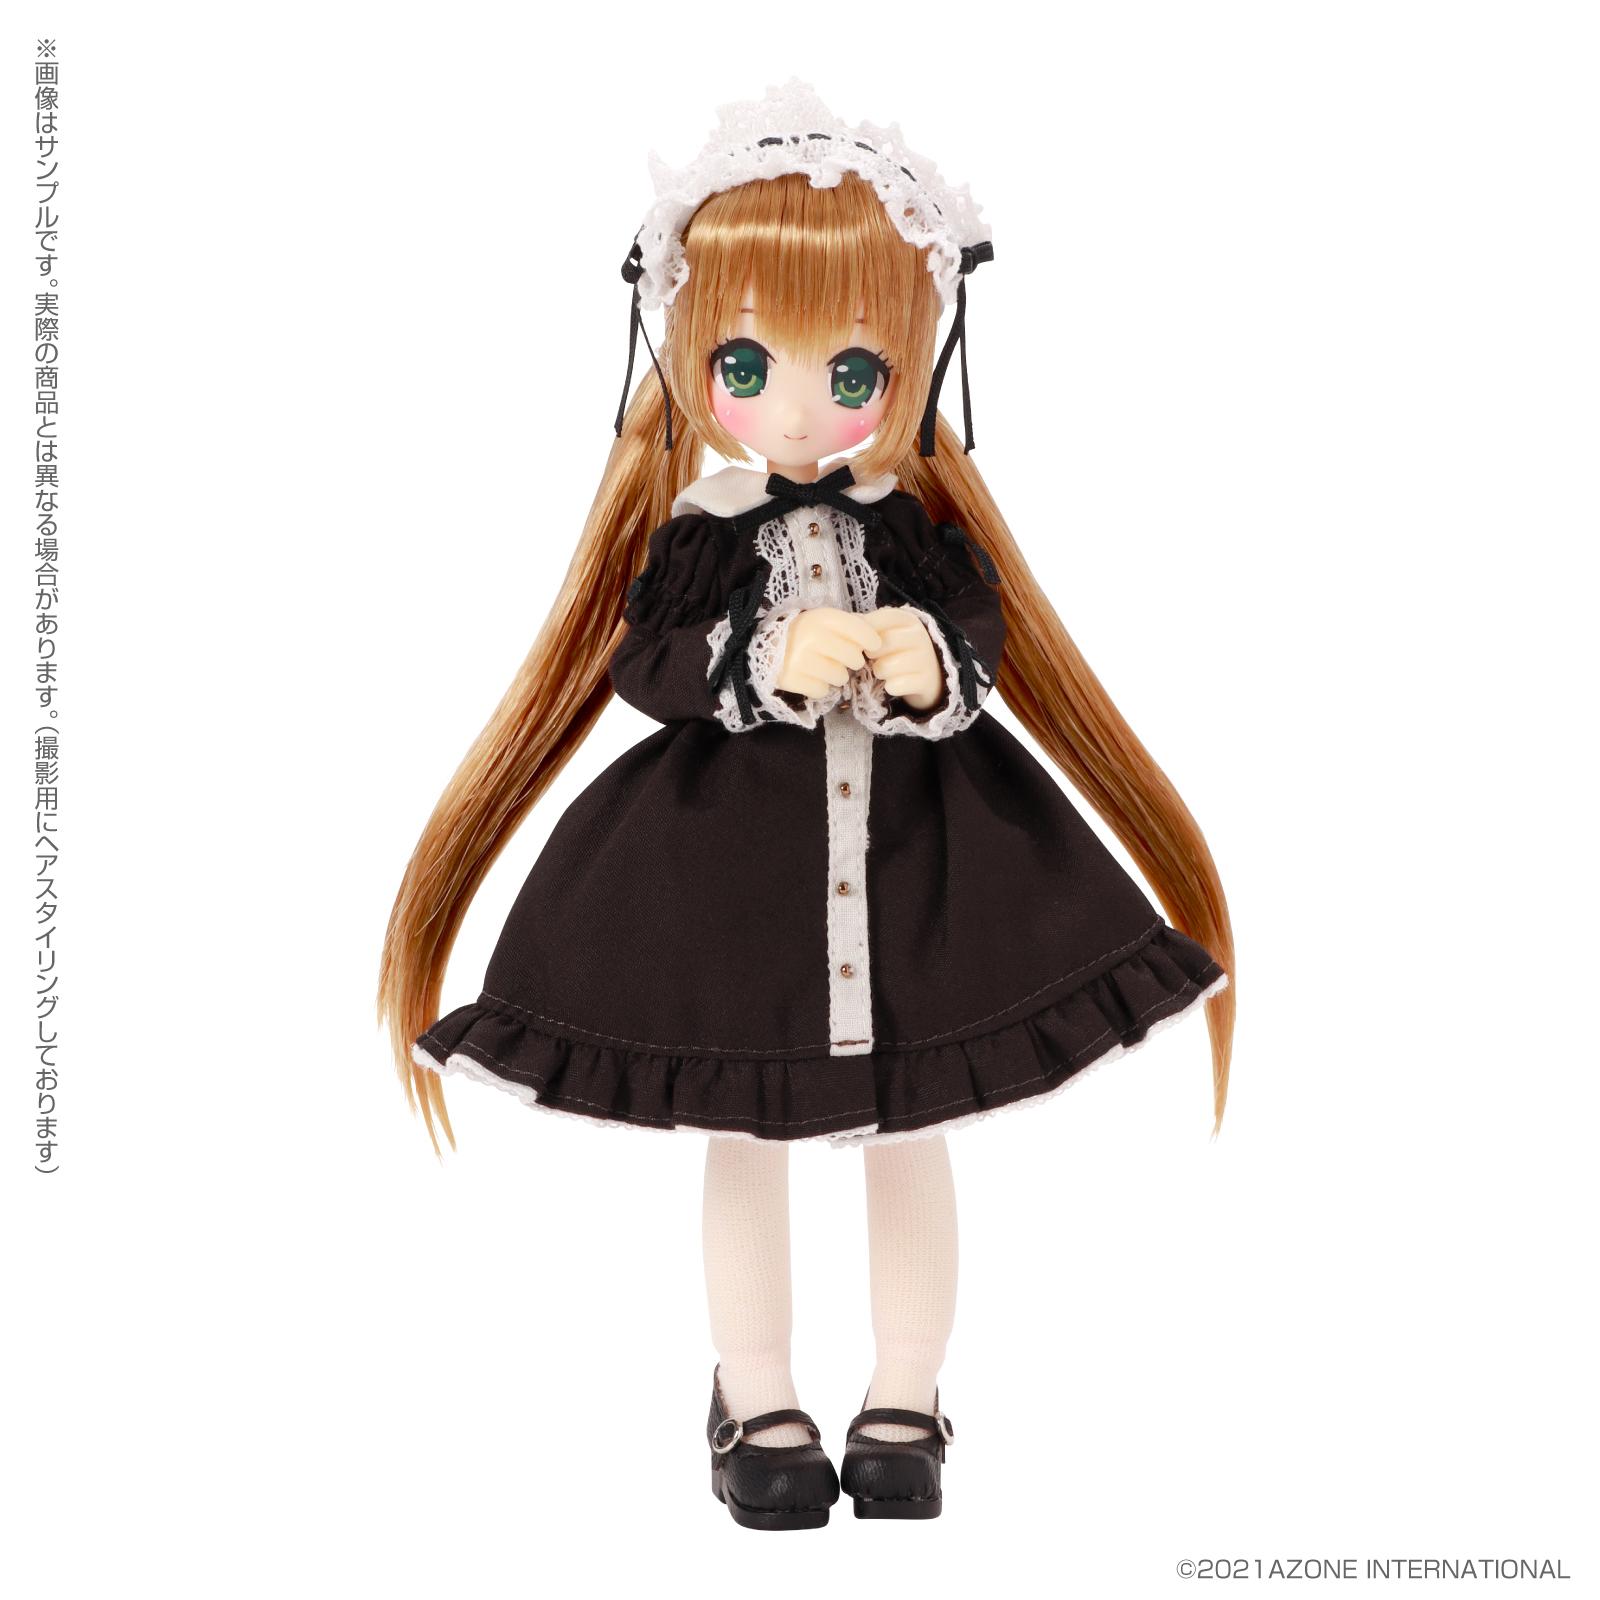 Lil'Fairy ~ちいさなお手伝いさん~『リプー 7th anniv.(ノーマル口ver.)』1/12 完成品ドール-020